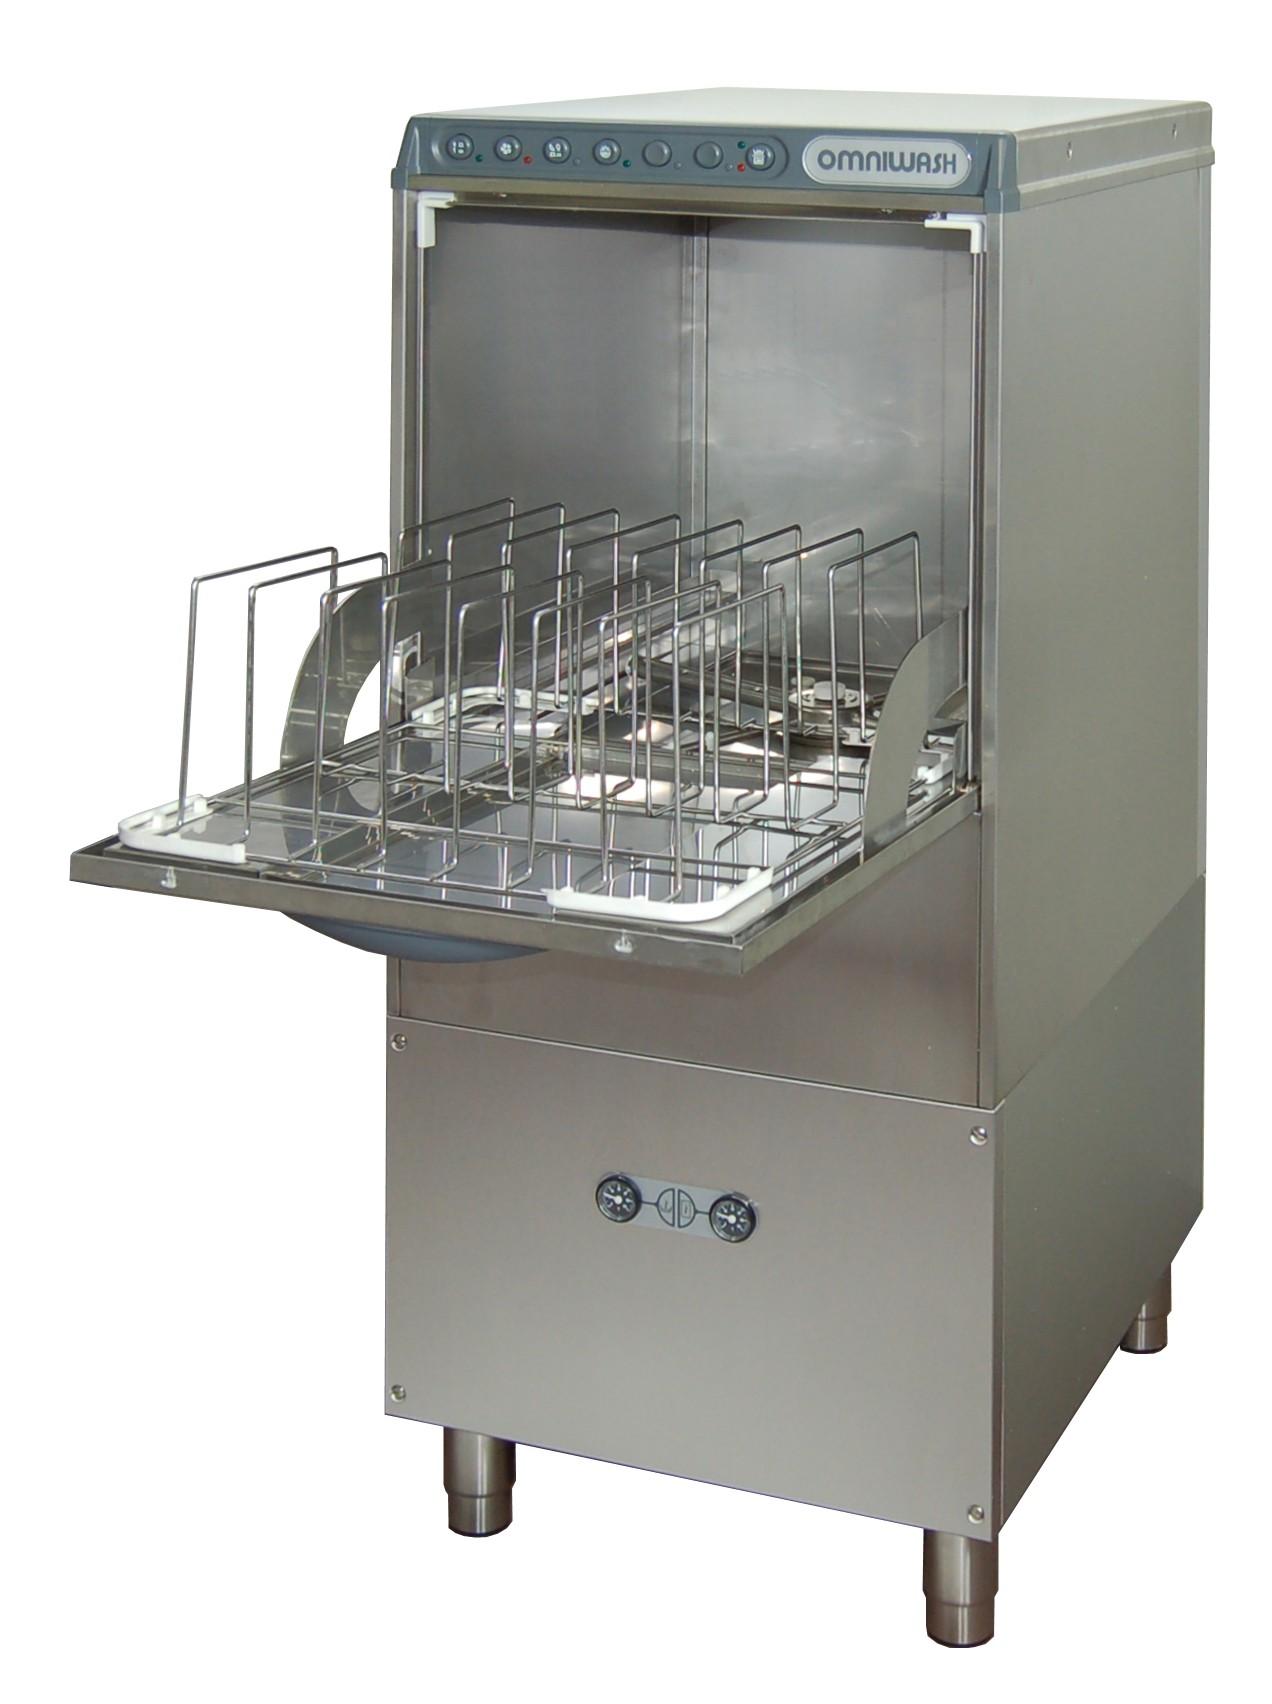 Macchine lavateglie professionali ristoranti pizzerie - Utensili cucina professionali ...